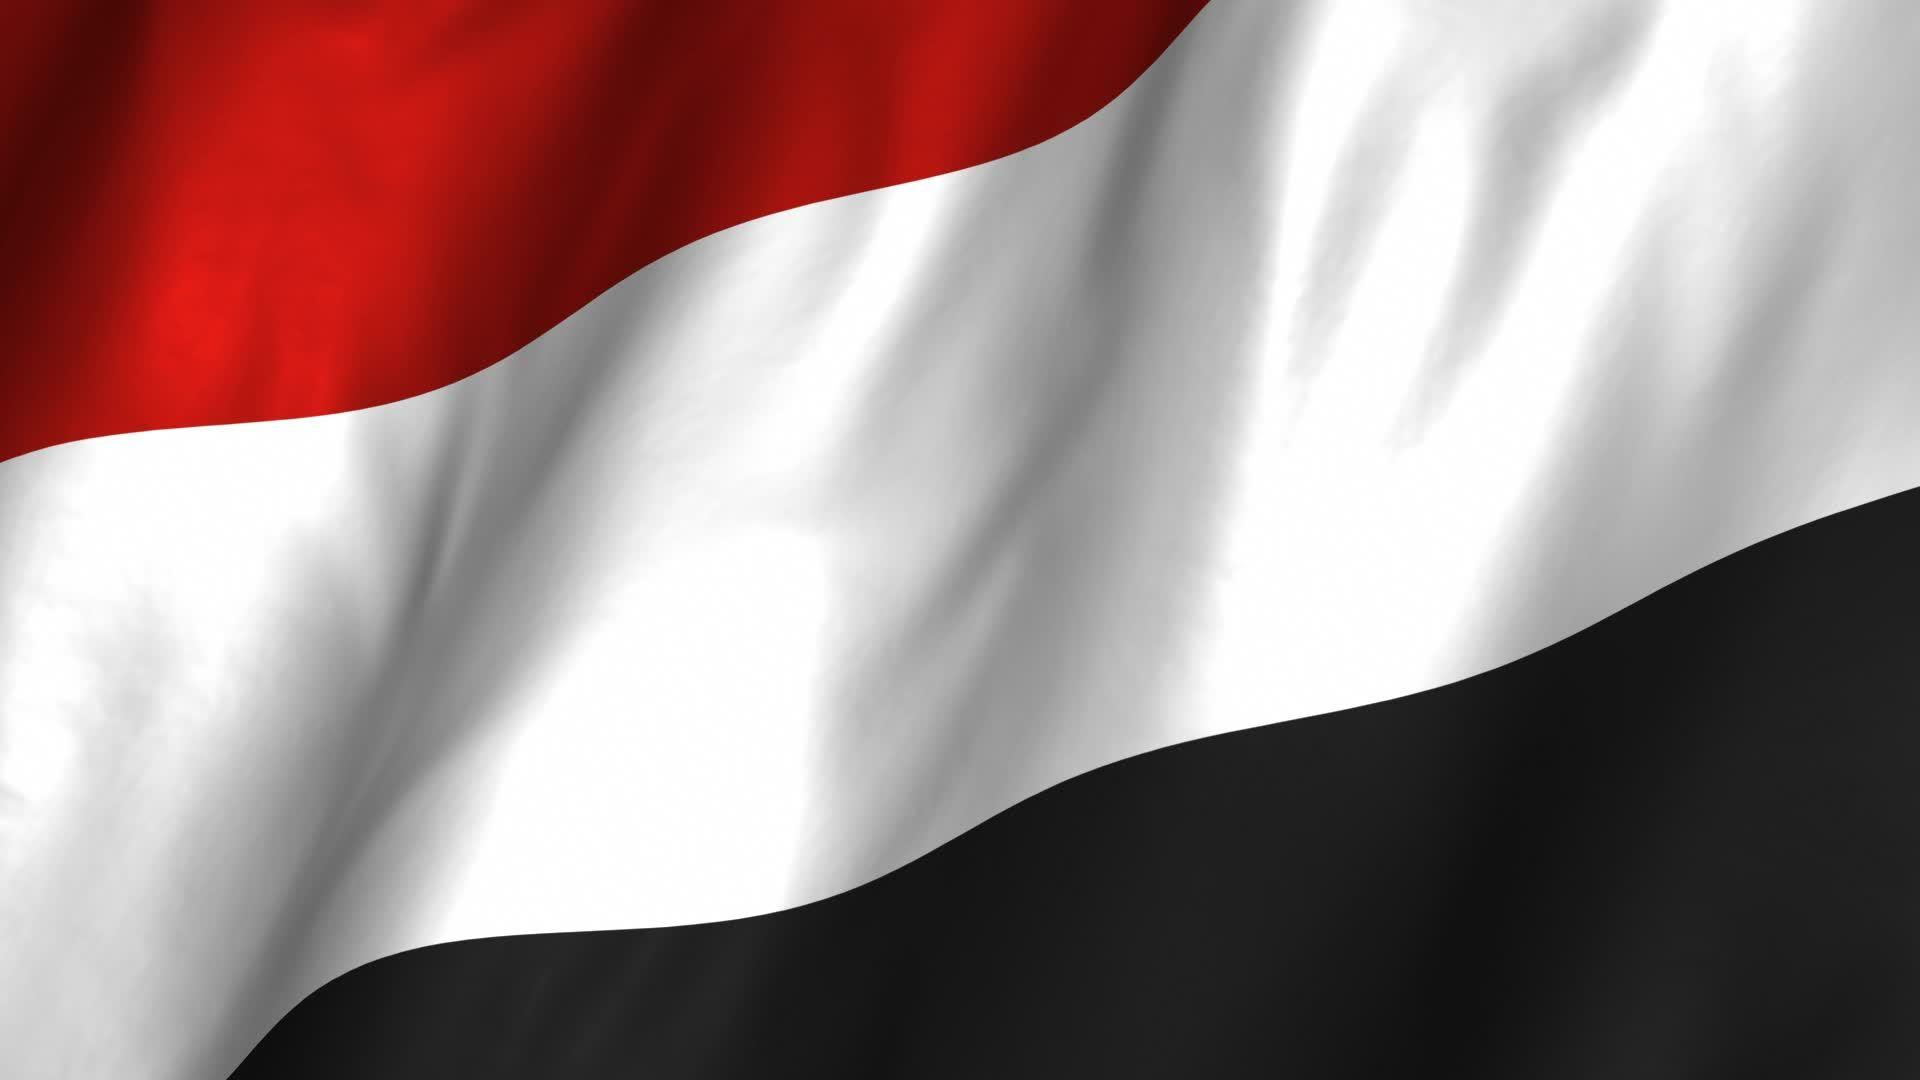 Yemen Flag Wallpaper - MixHD wallpapers